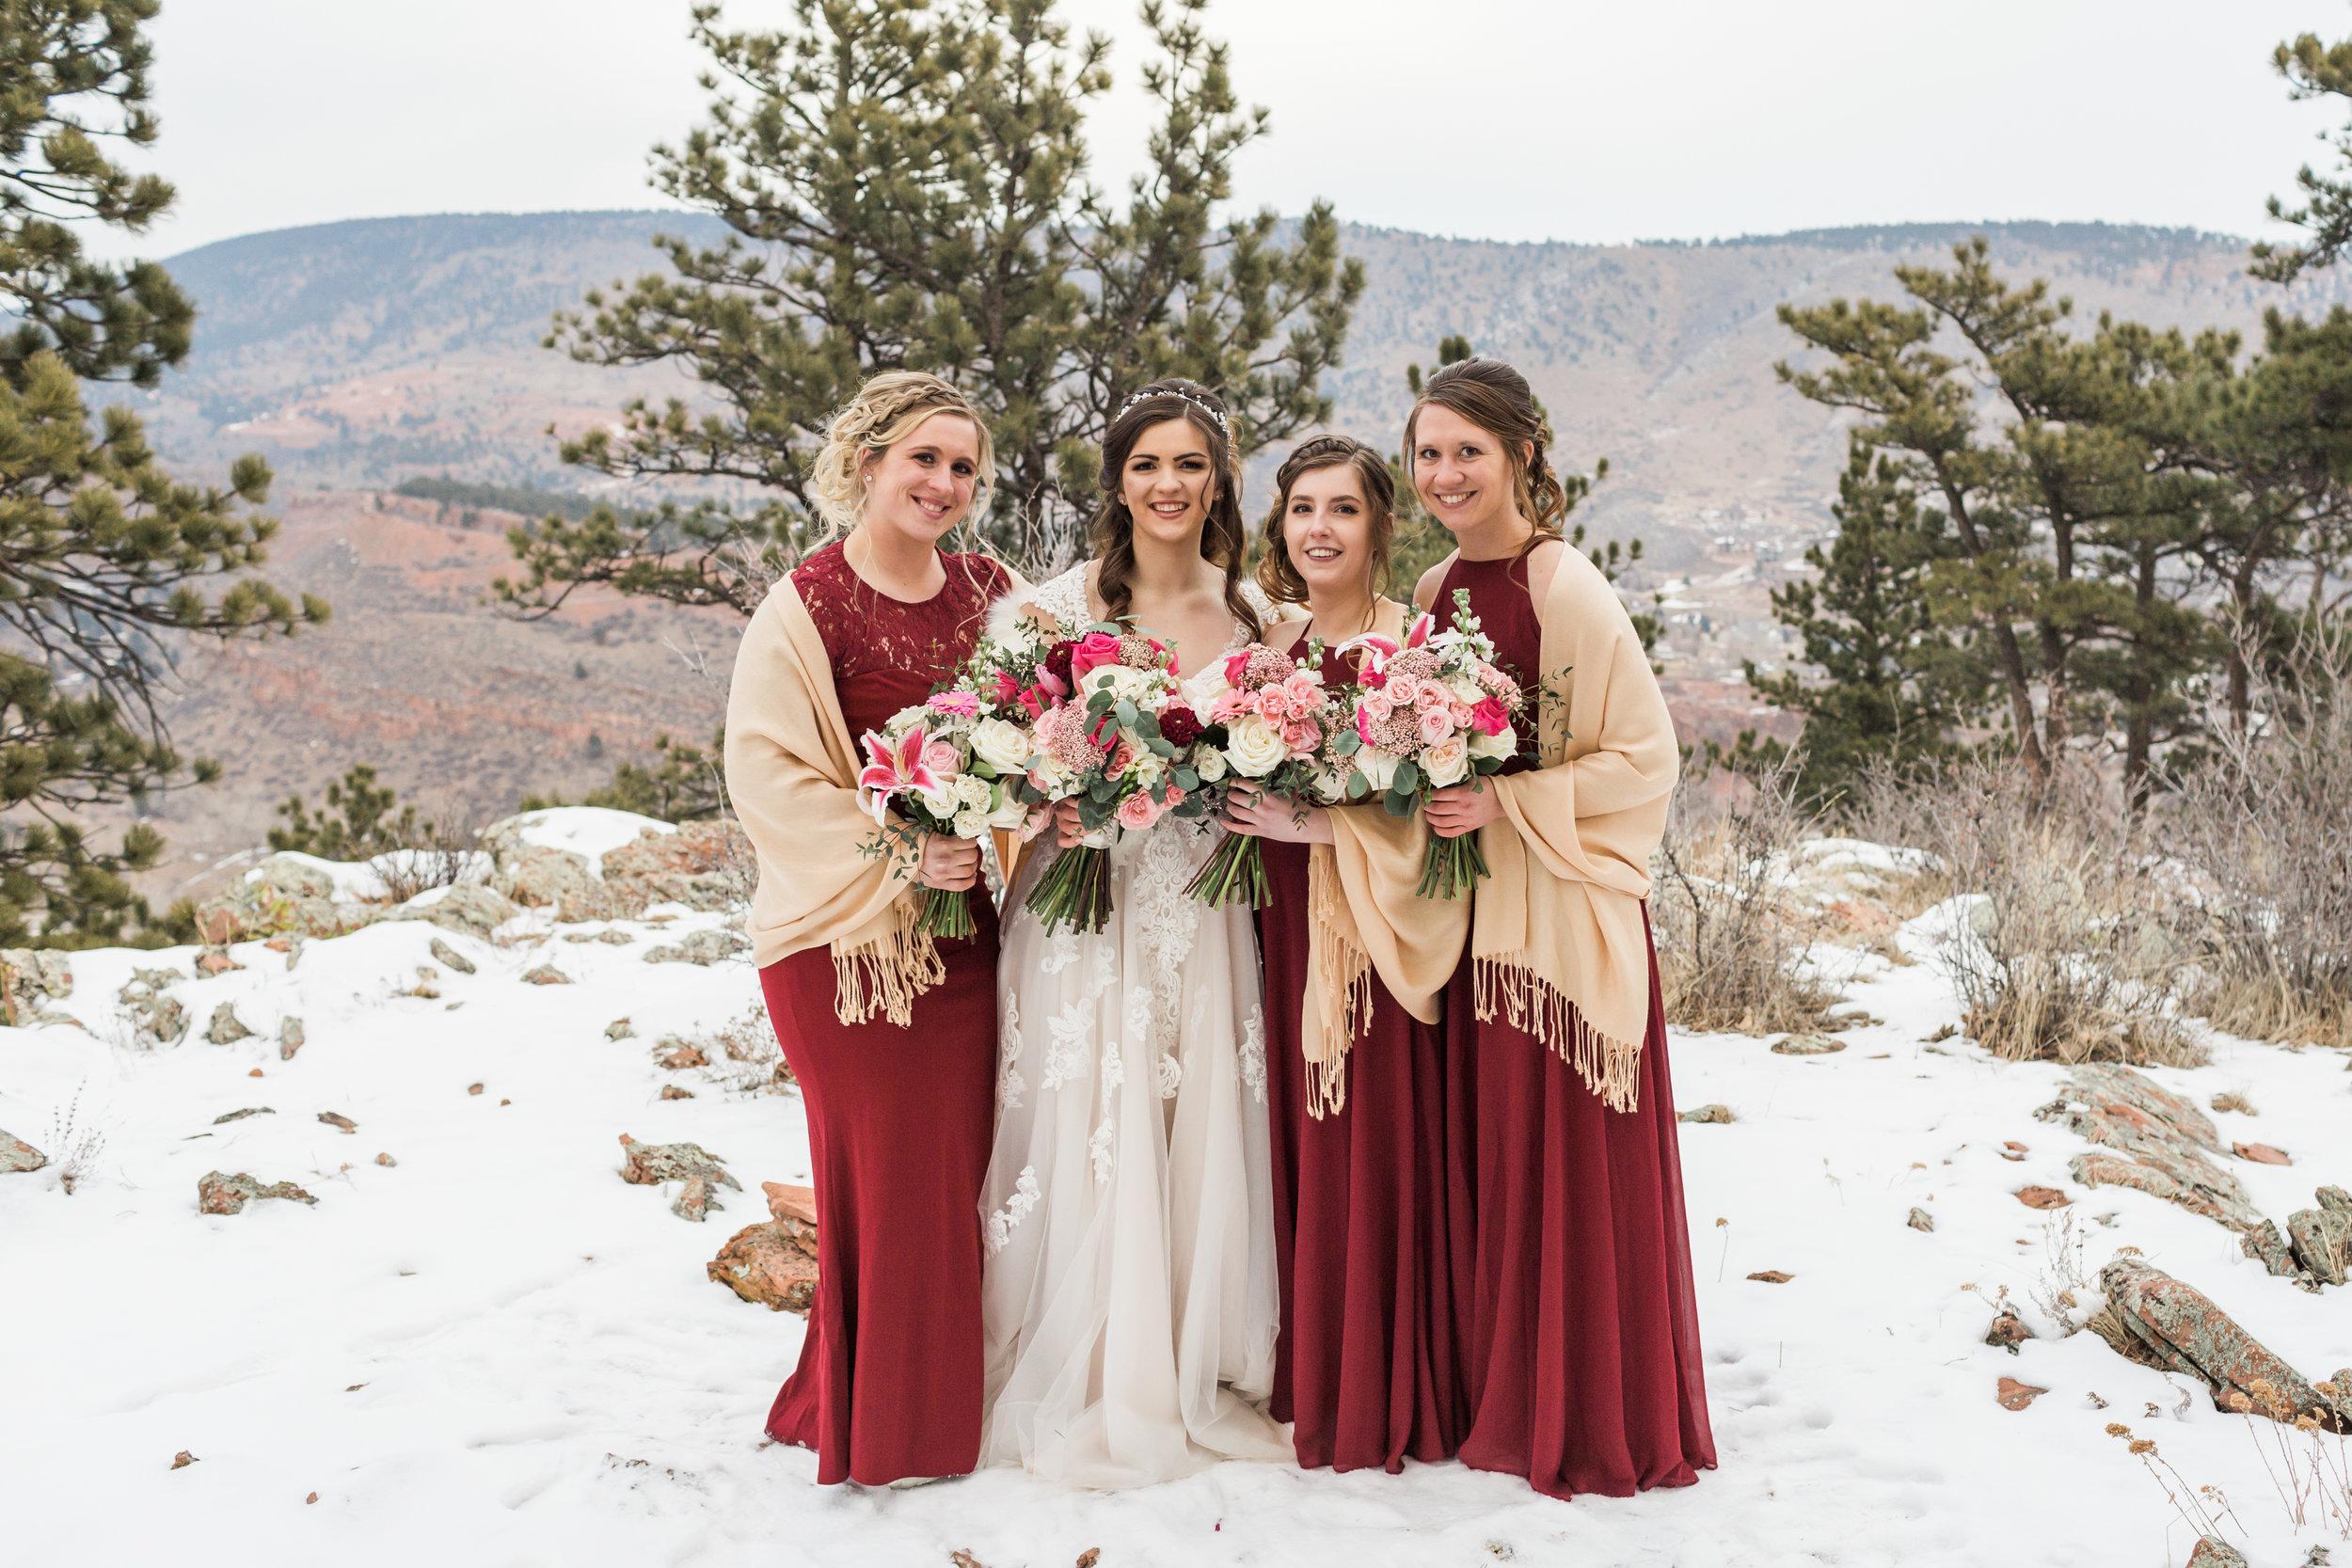 romanticcoloradodestinationwedding-40.jpg